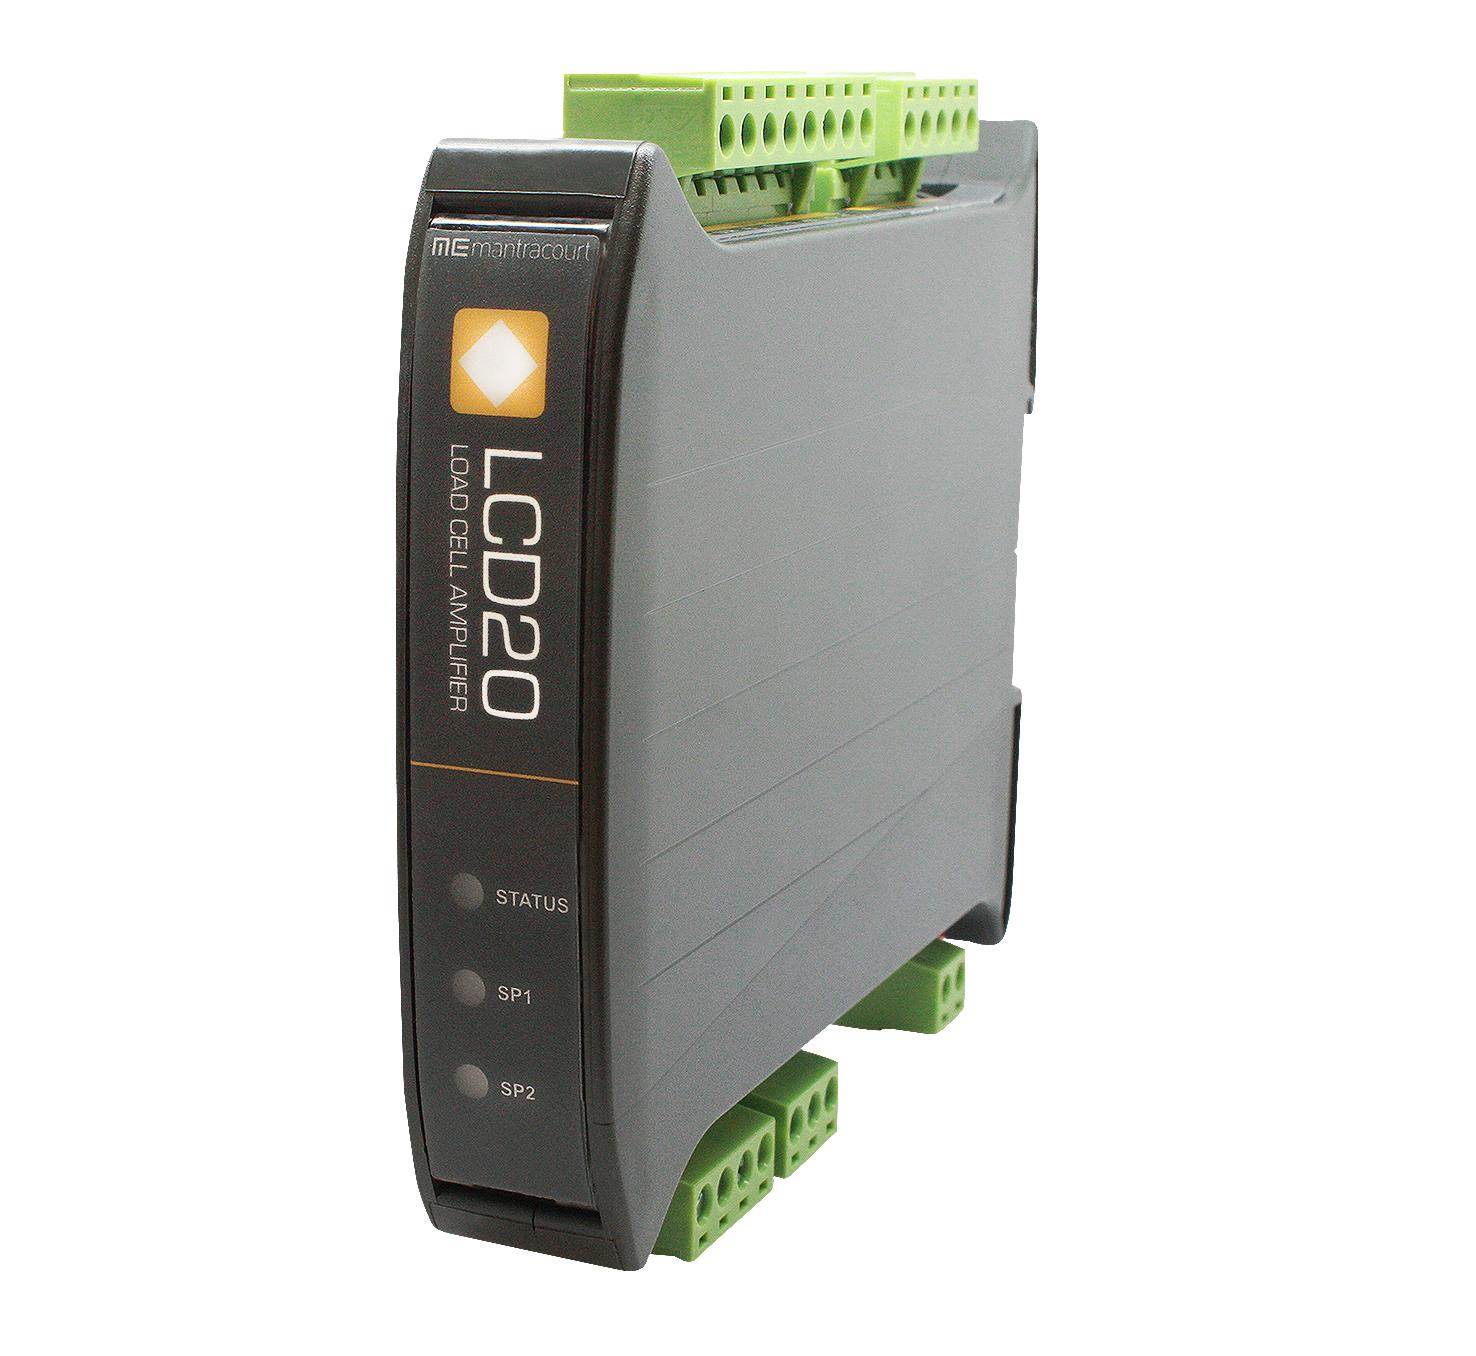 Load Cell Signal Amplifier Strain Gauge Bridge Din Measurement Circuit Lcd20frontview Highres Tmedit